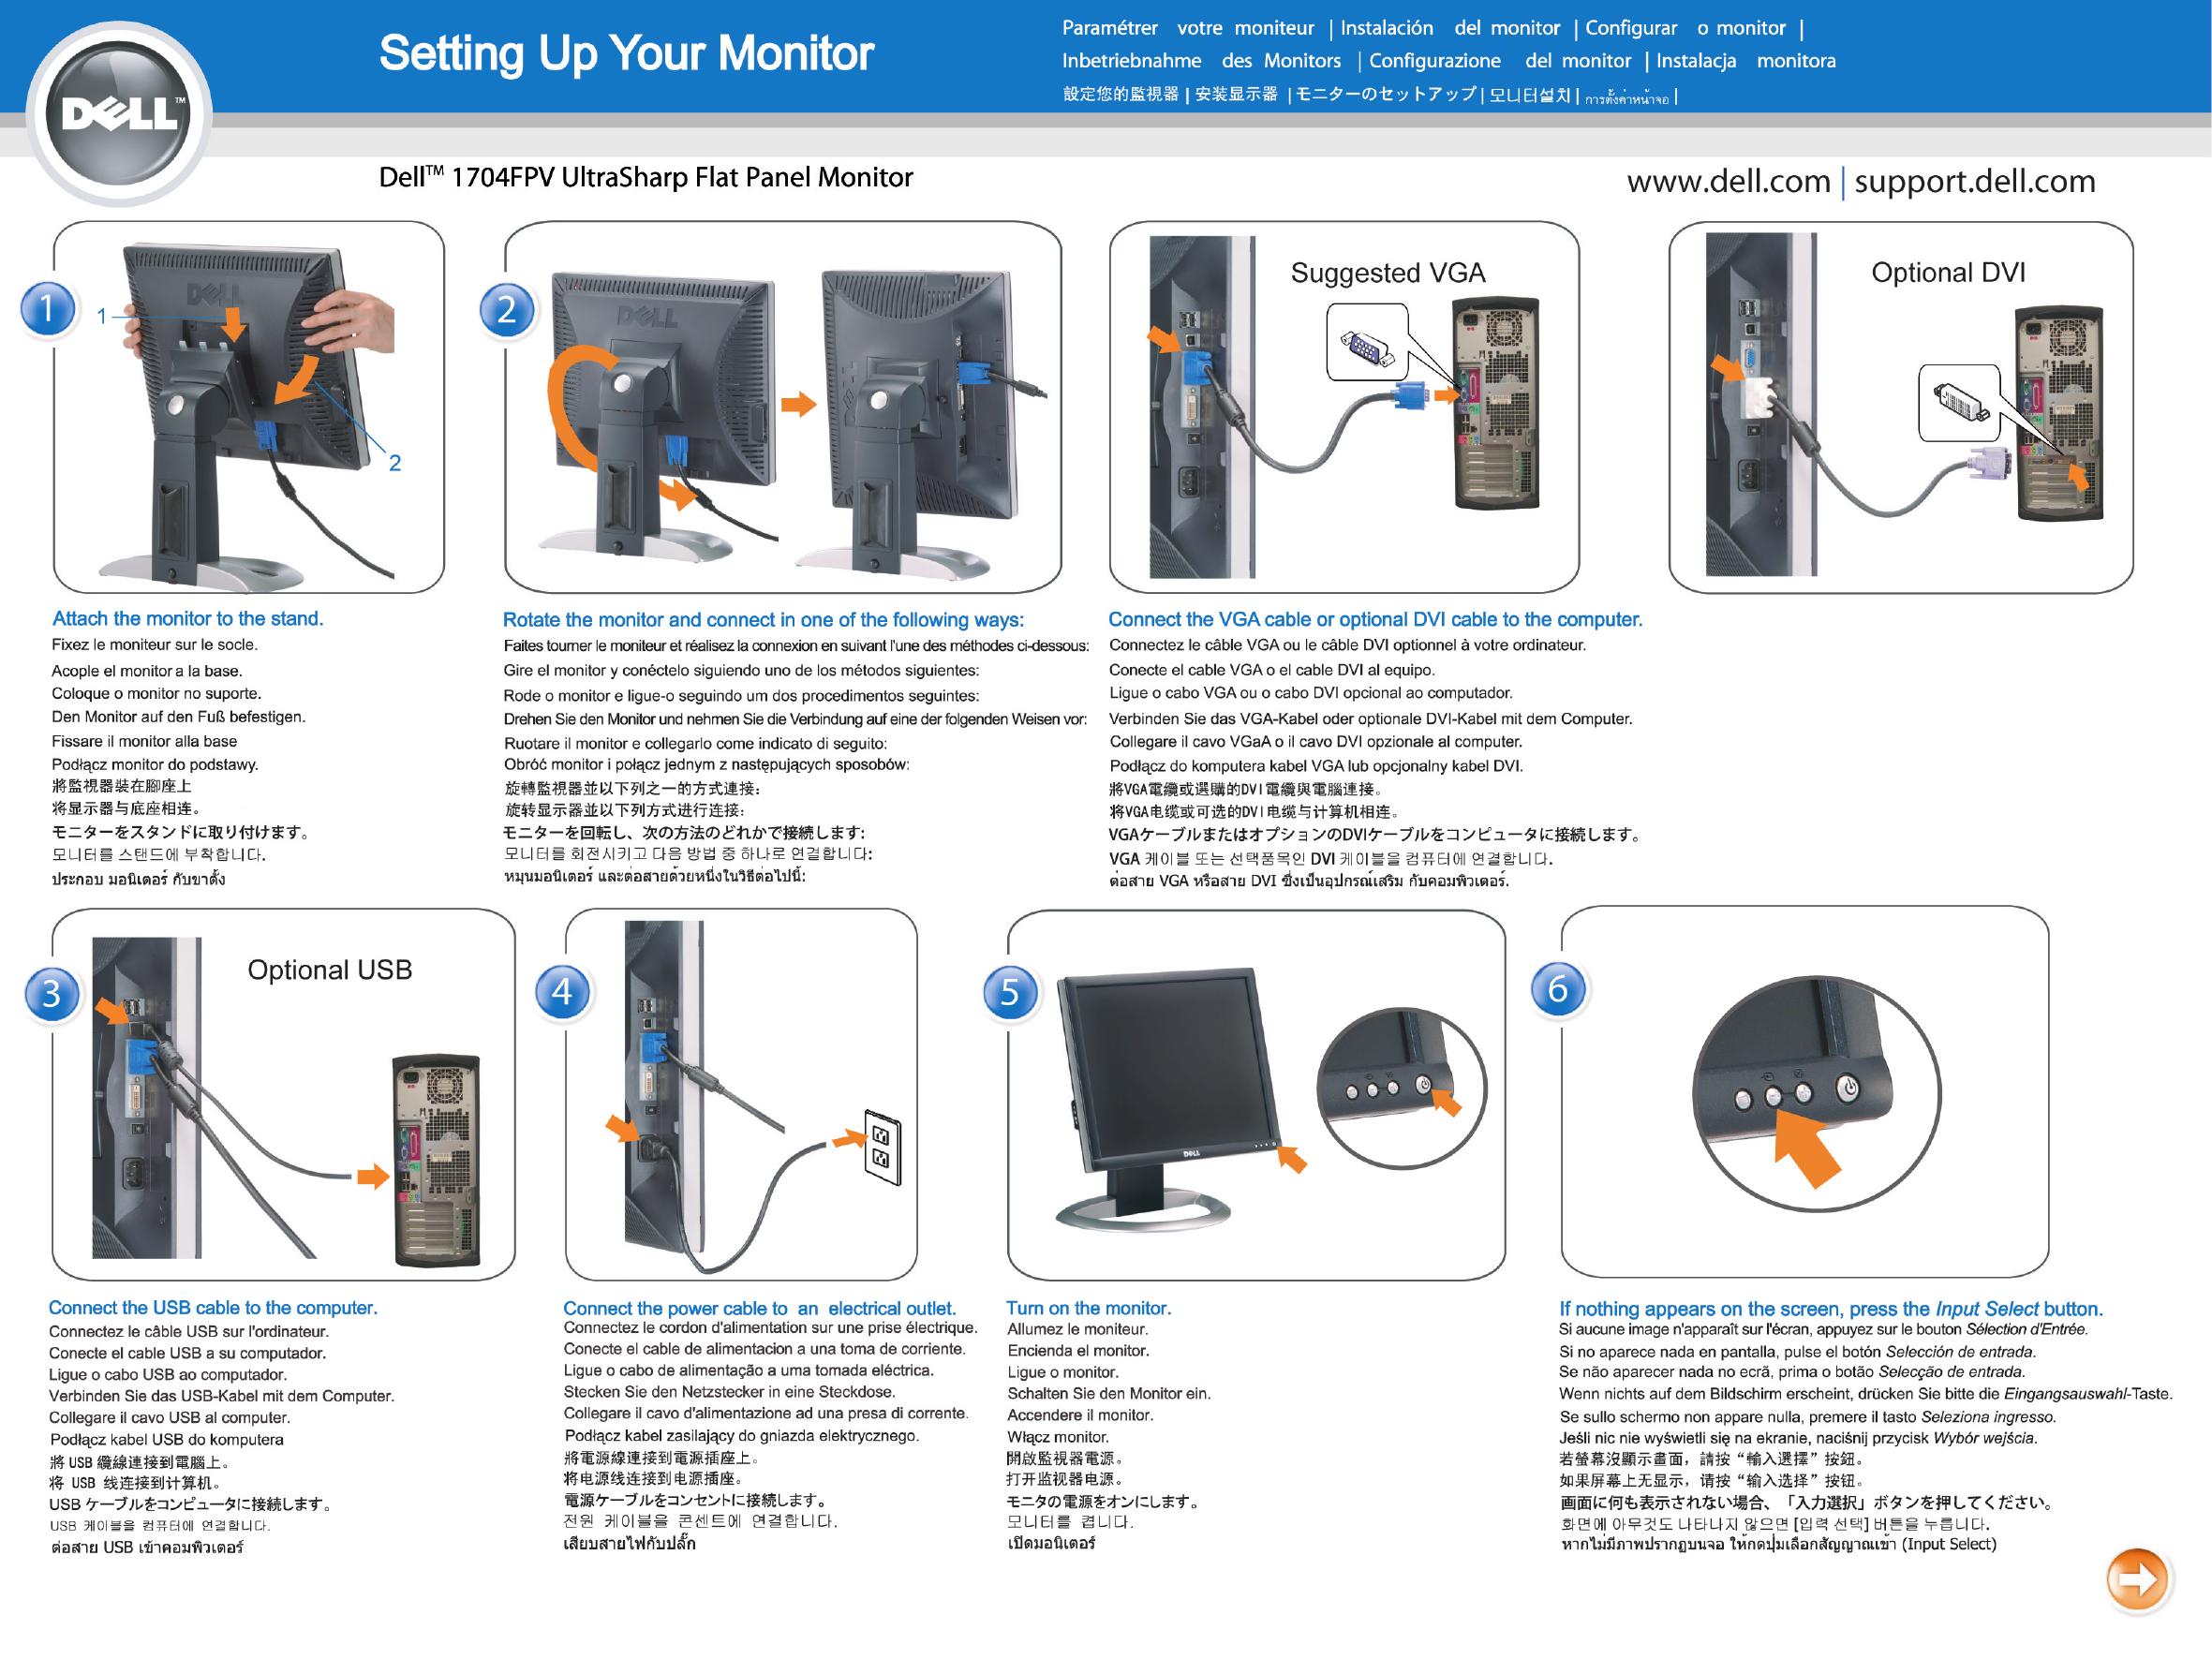 dell computer monitor 1704fpv users manual 1704fp user guide rh usermanual wiki dell desktop manuals pdf13668 dell desktop manual pdf